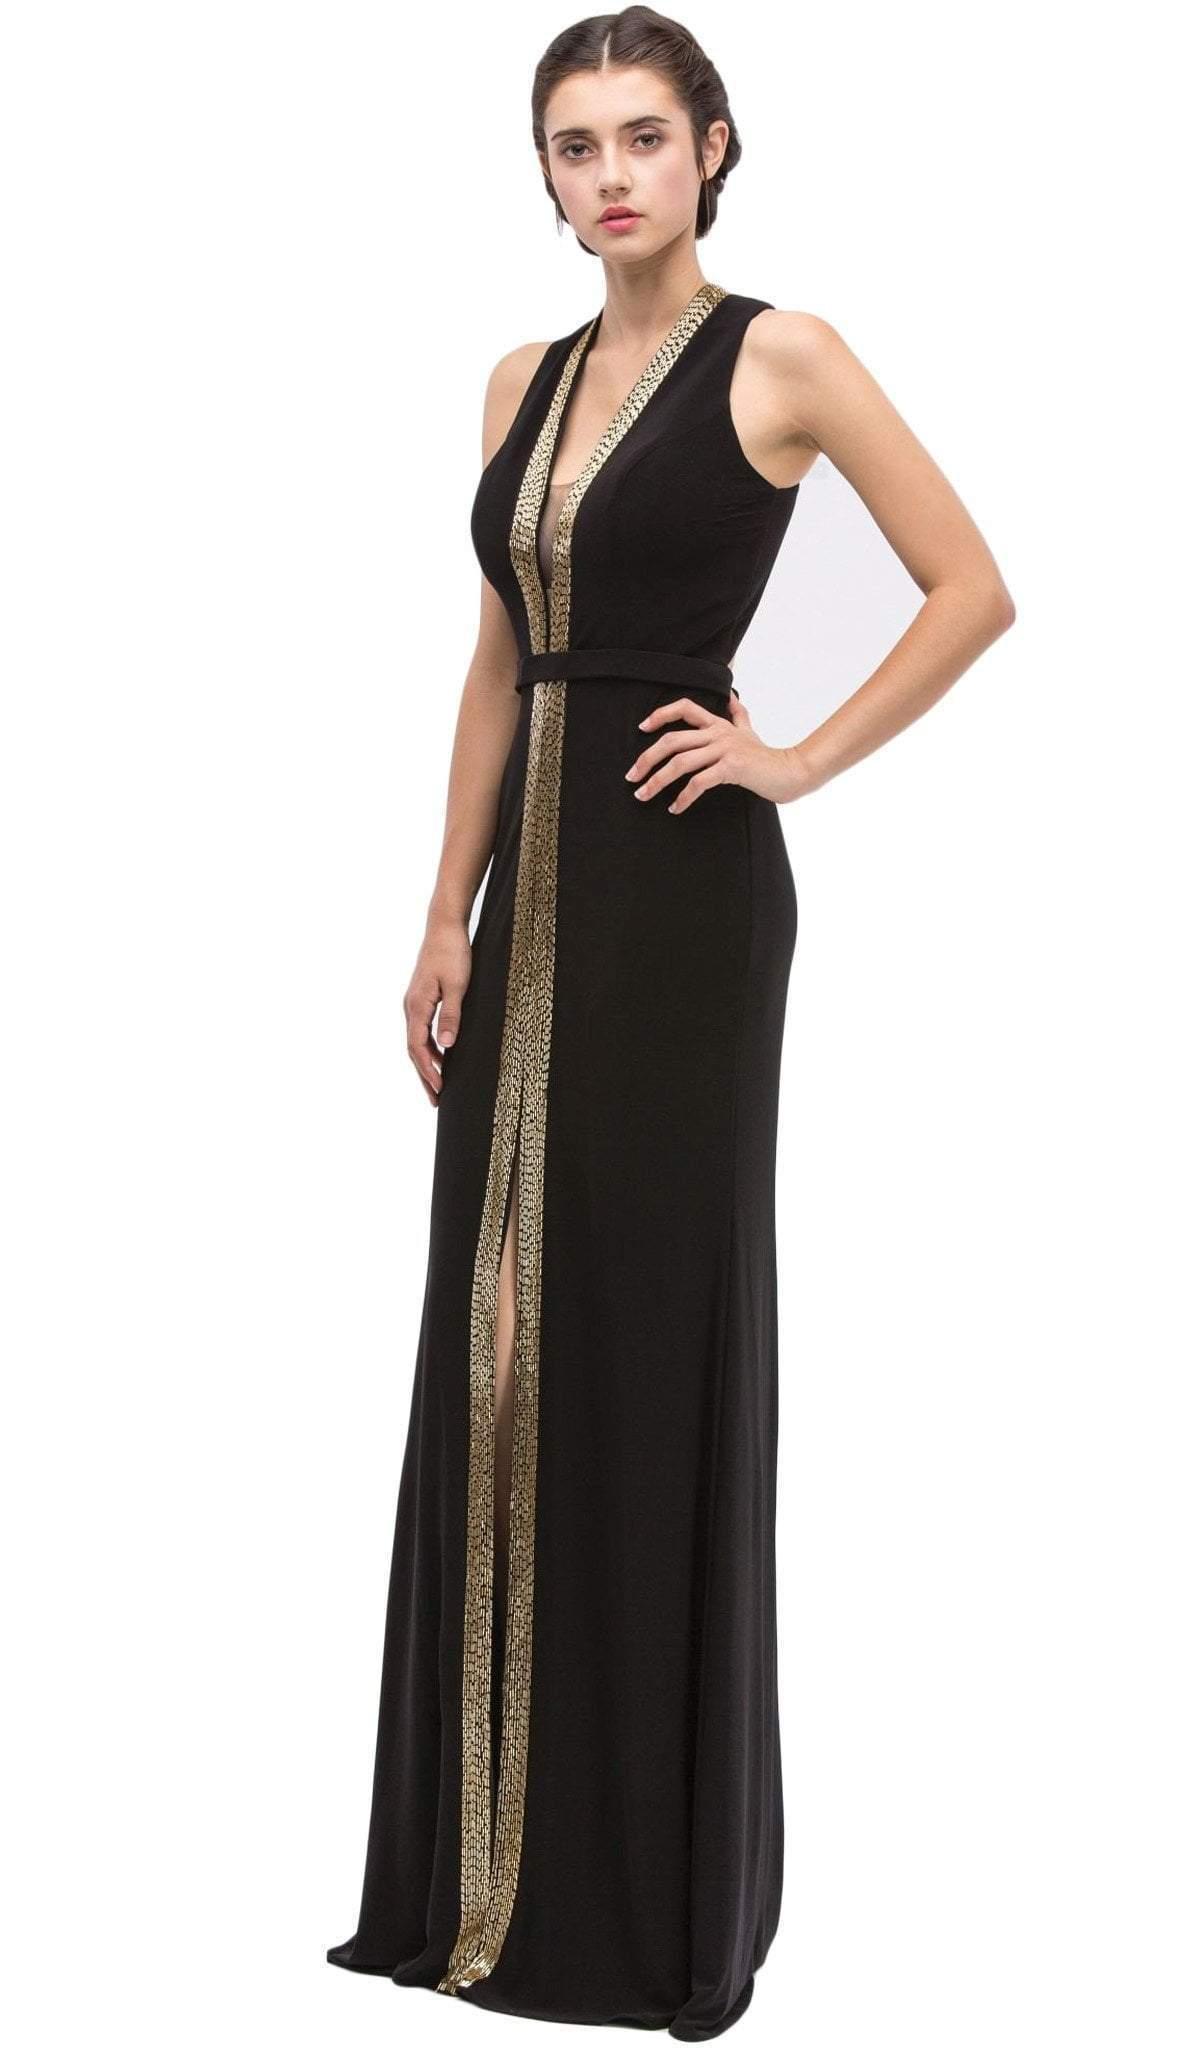 Eureka Fashion - Plunging Gold Beading Fitted Evening Dress